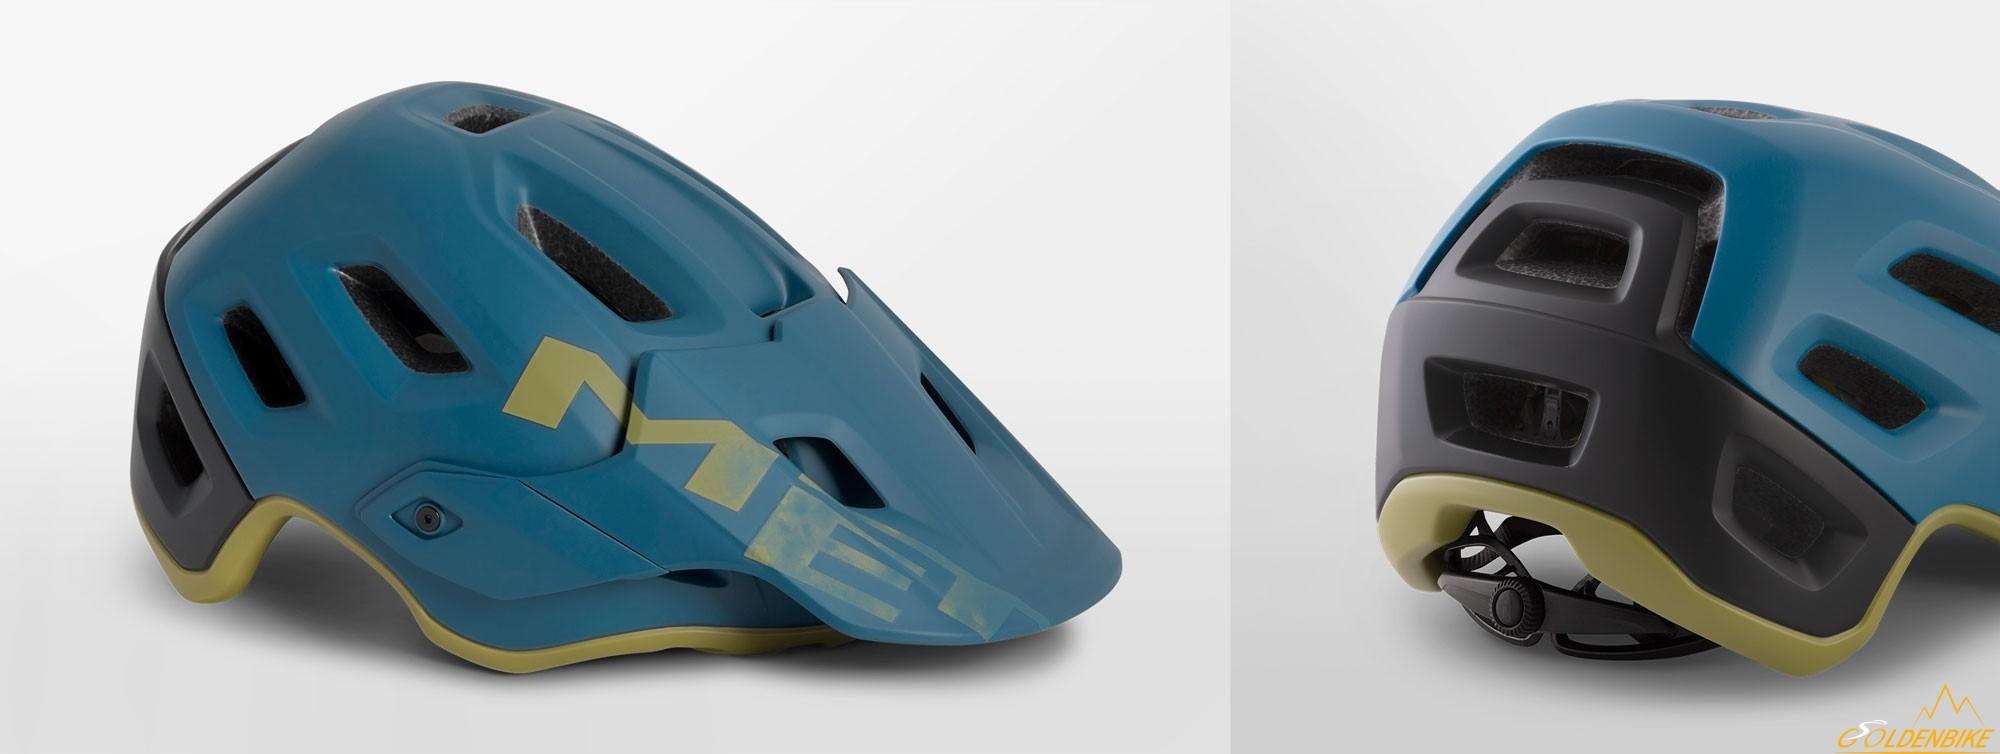 Шлем MET Roam Legion Blue Sand Matt 0